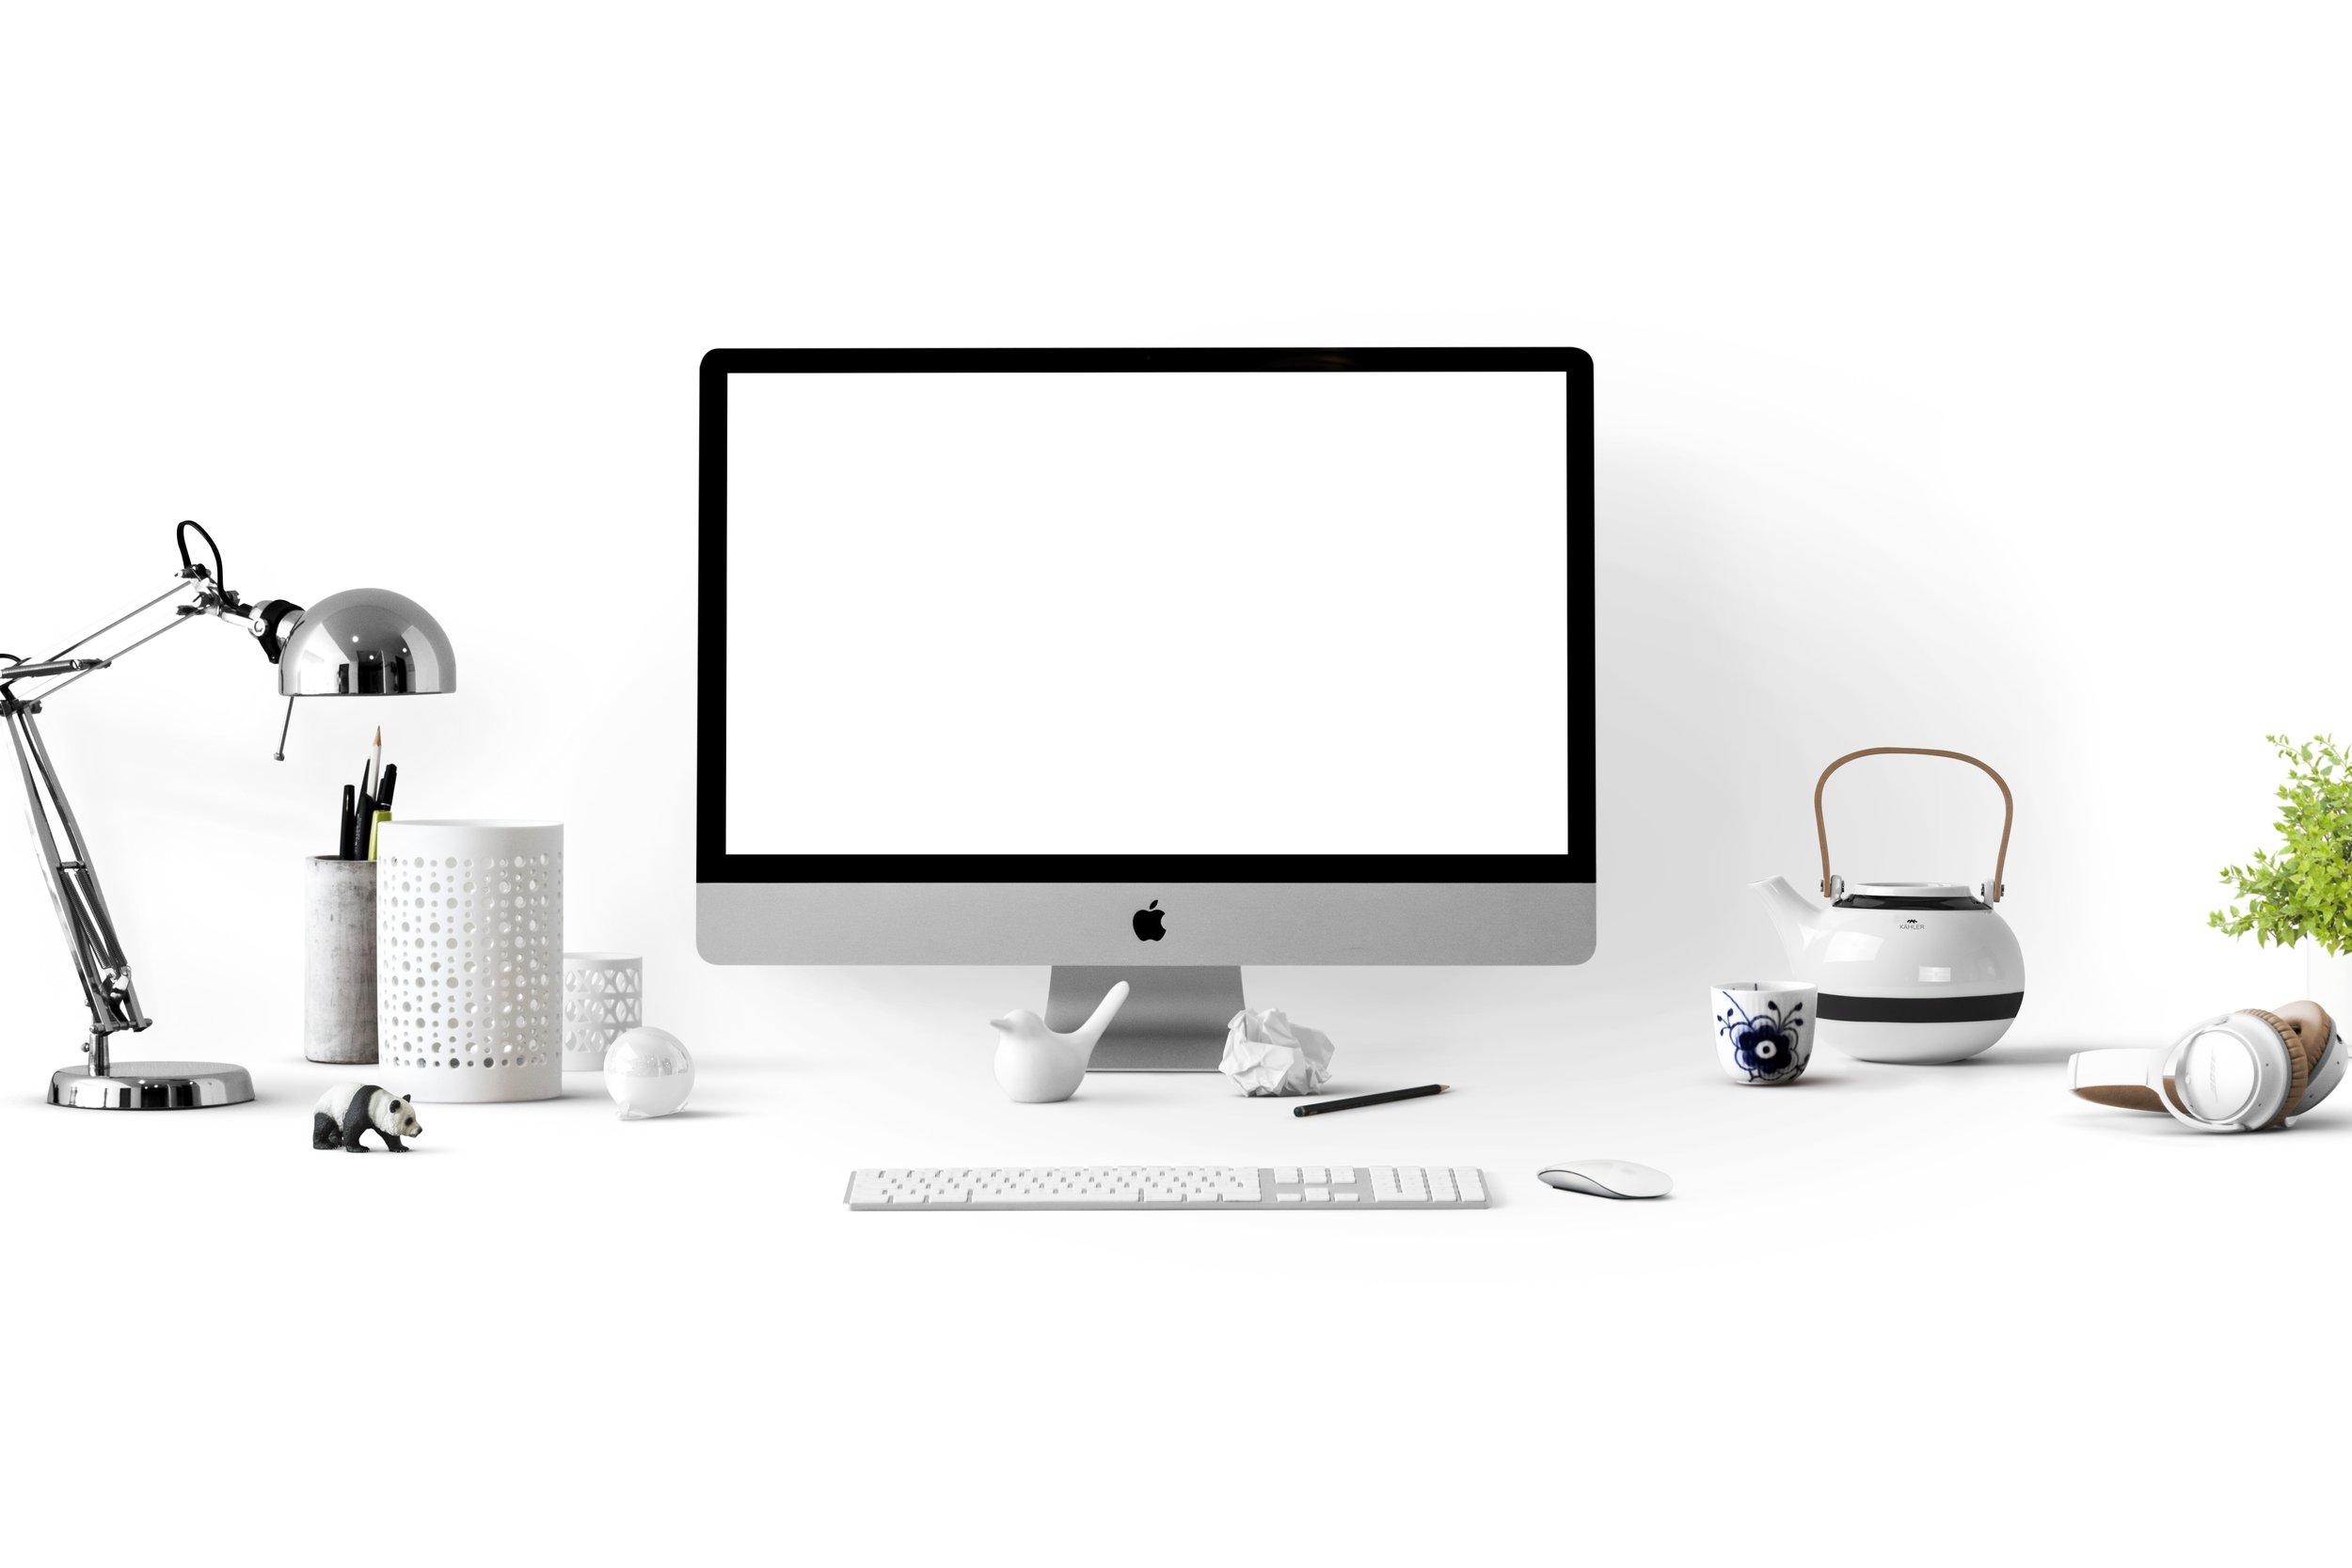 apple-apple-devices-business-205316.jpg